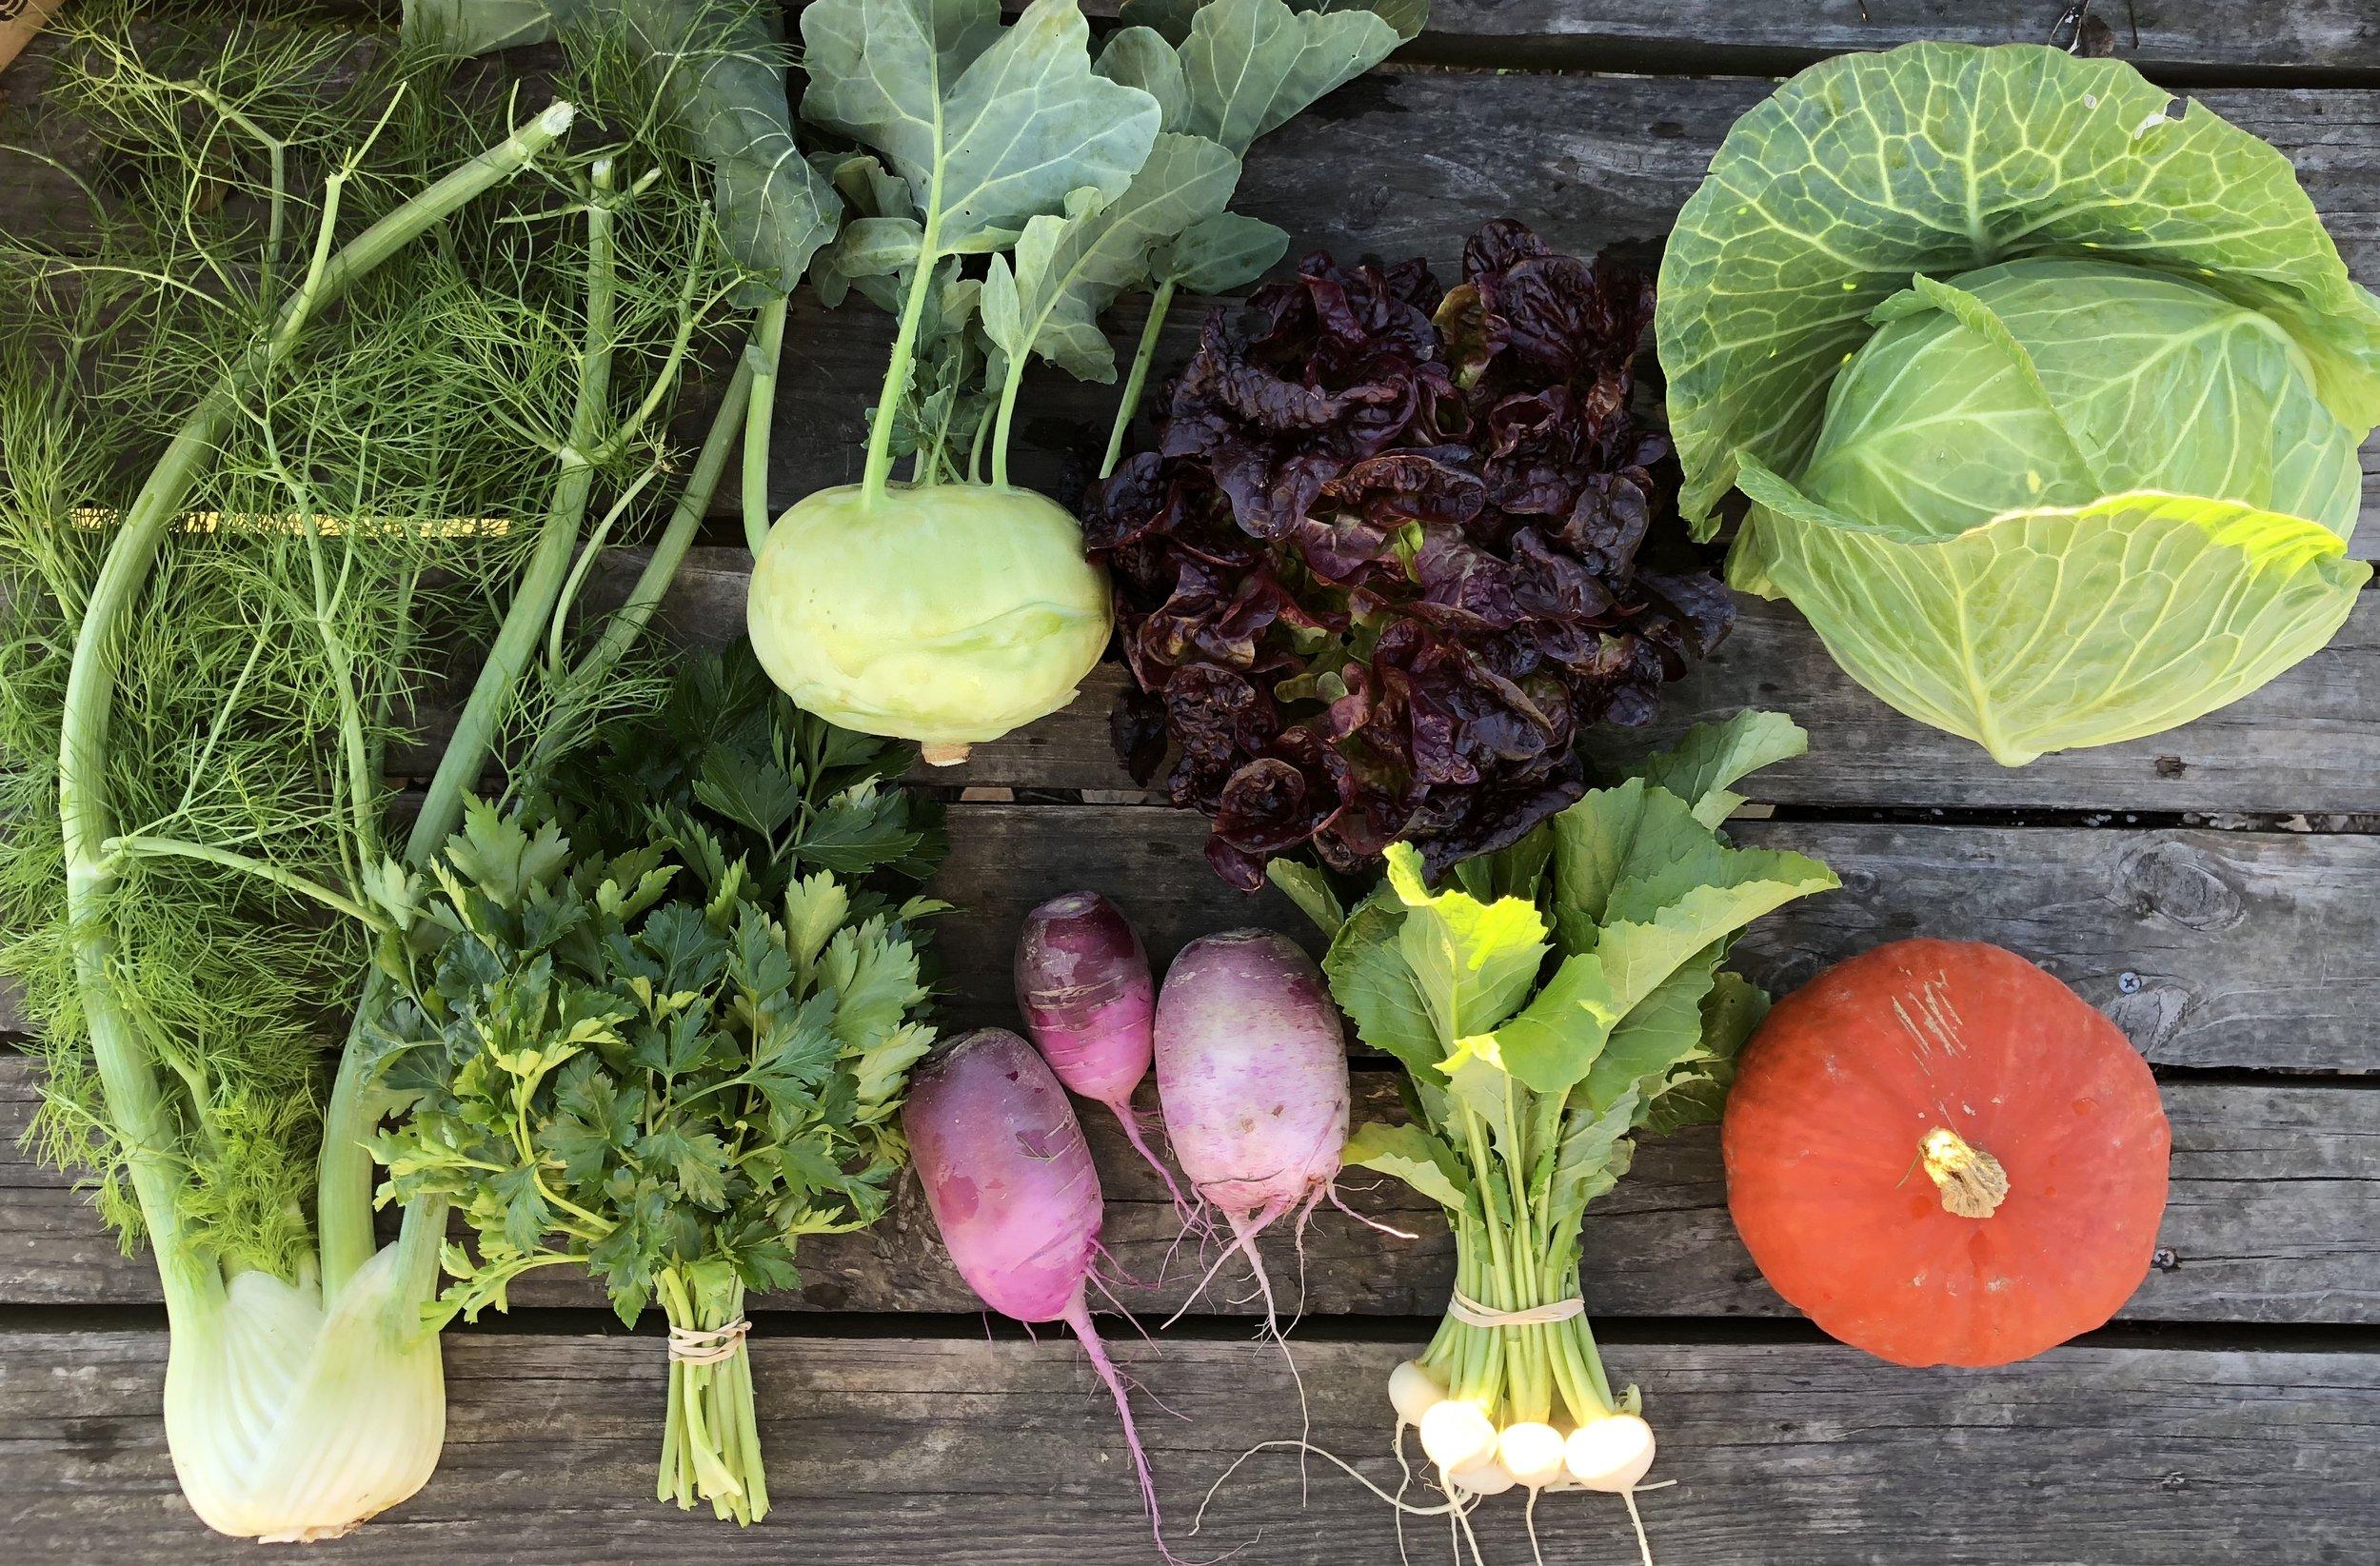 Top Row: Kohlrabi, Lettuce, and Cabbage  Bottom Row: Fennel, Parsley, Daikon Radish, Hakurei Turnips, and Kabocha Squash